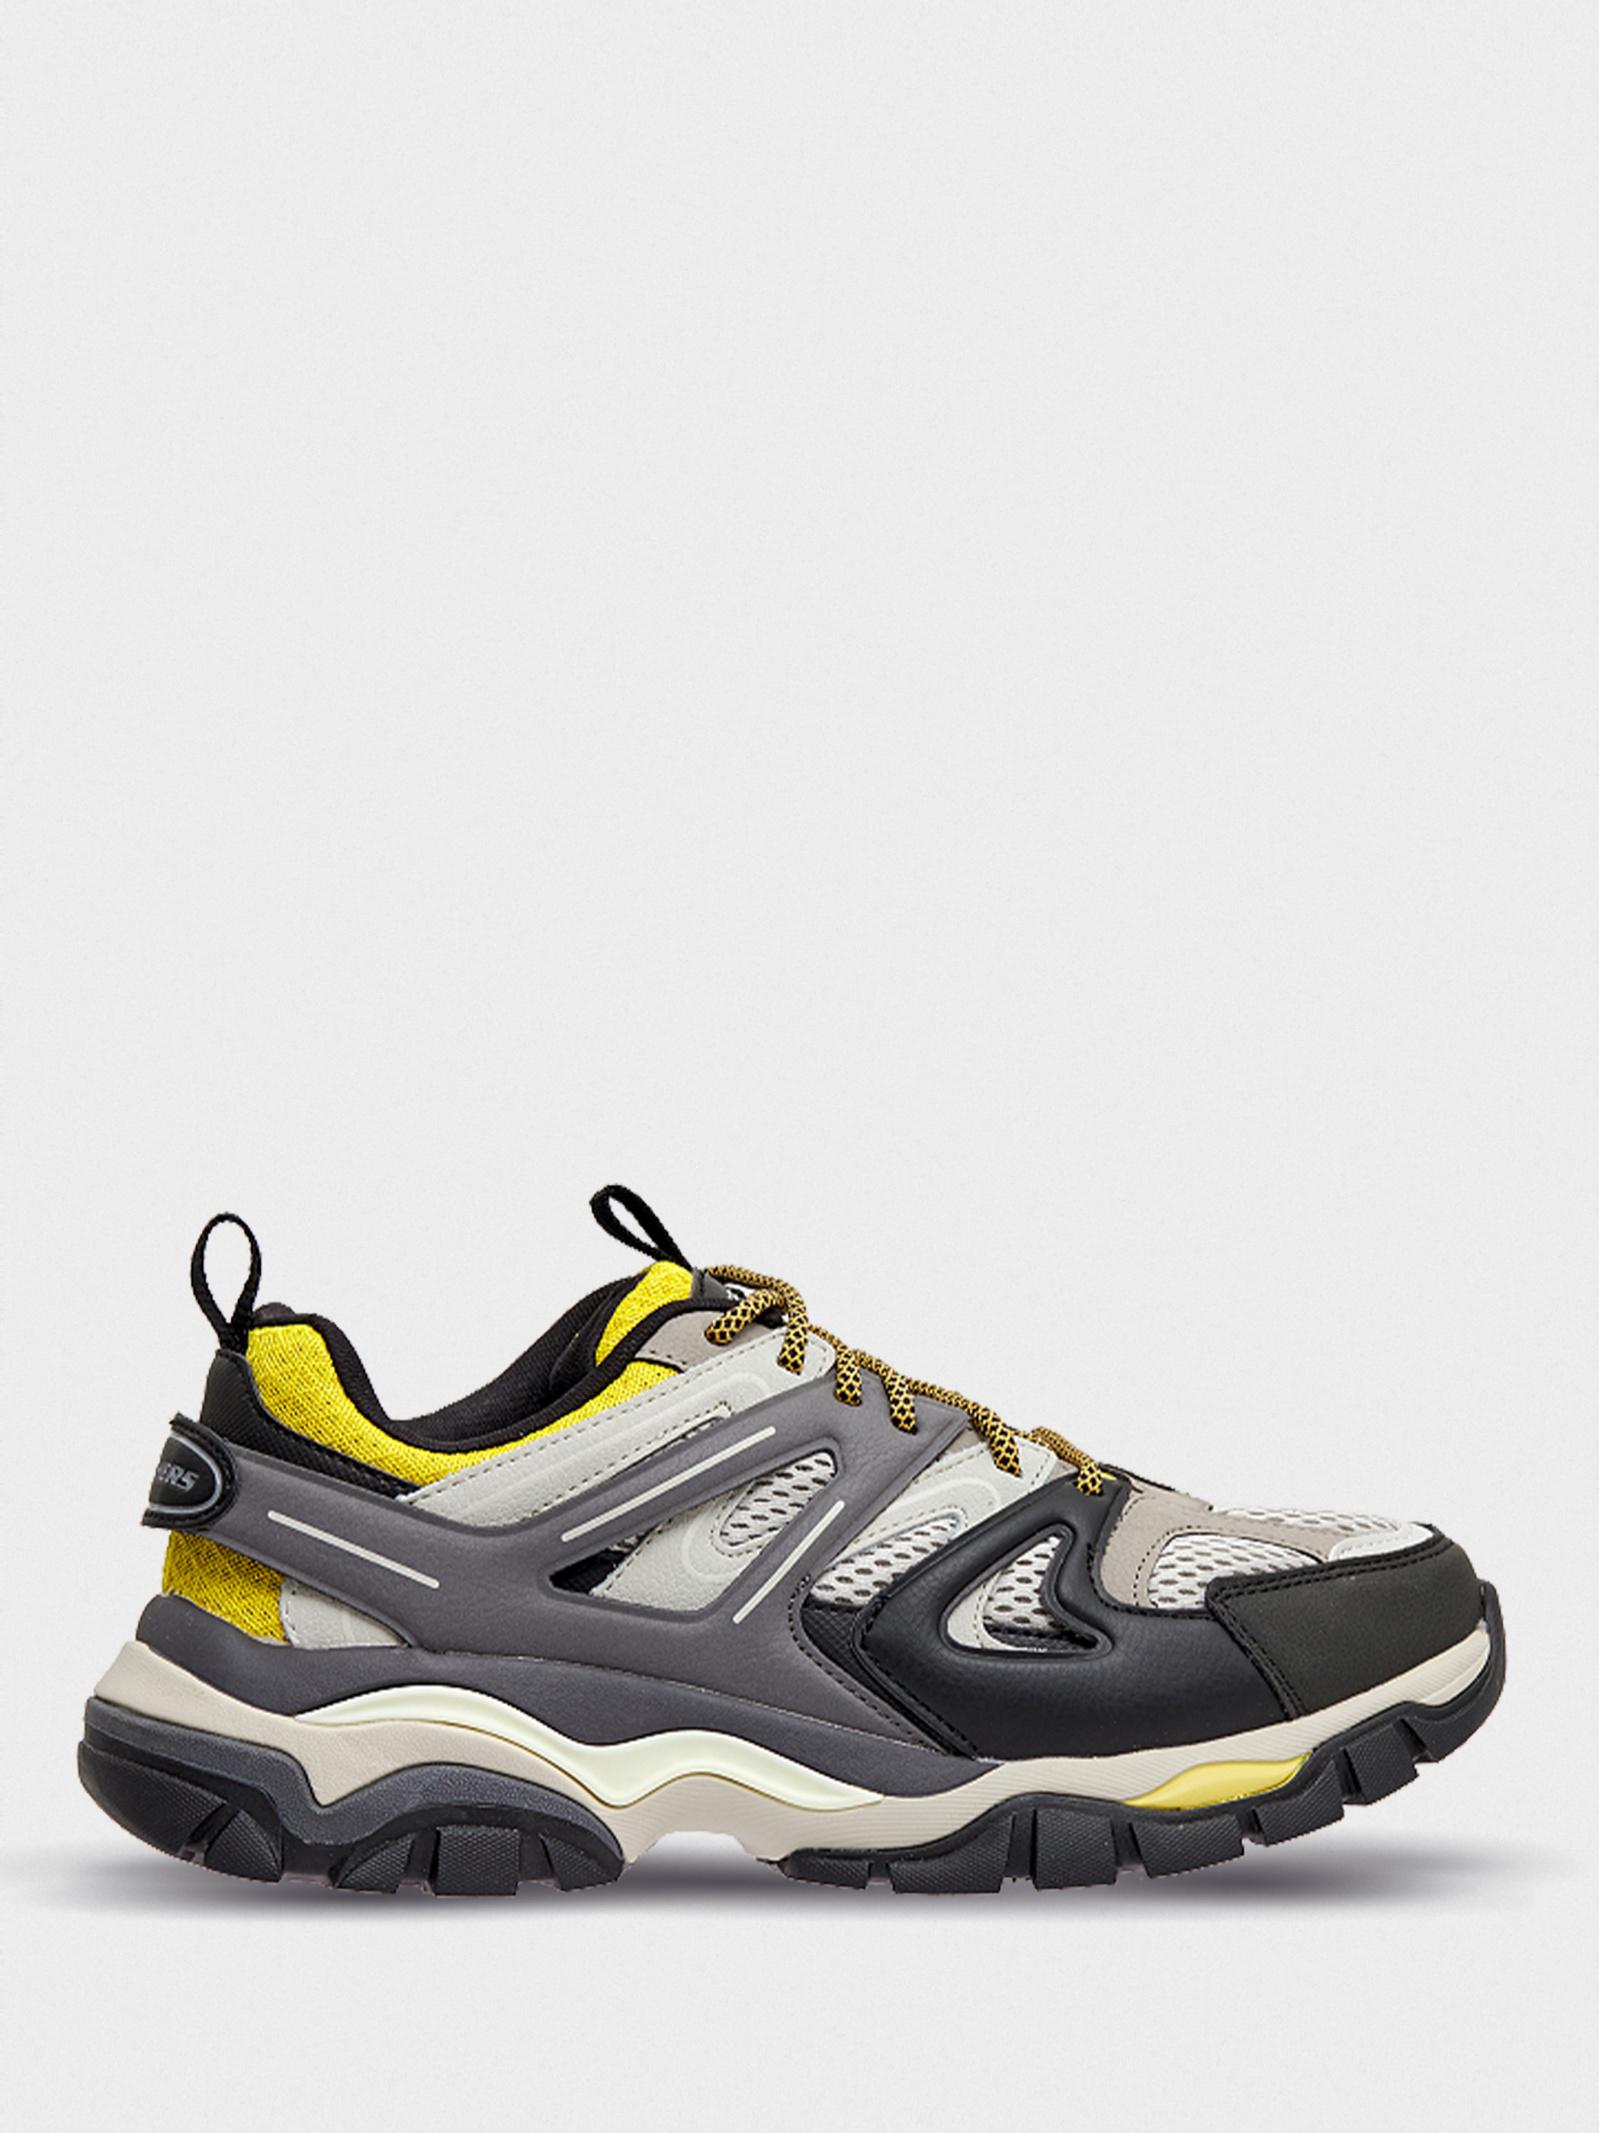 Кроссовки для мужчин Skechers USA Streetwear 66255 LTGY модная обувь, 2017